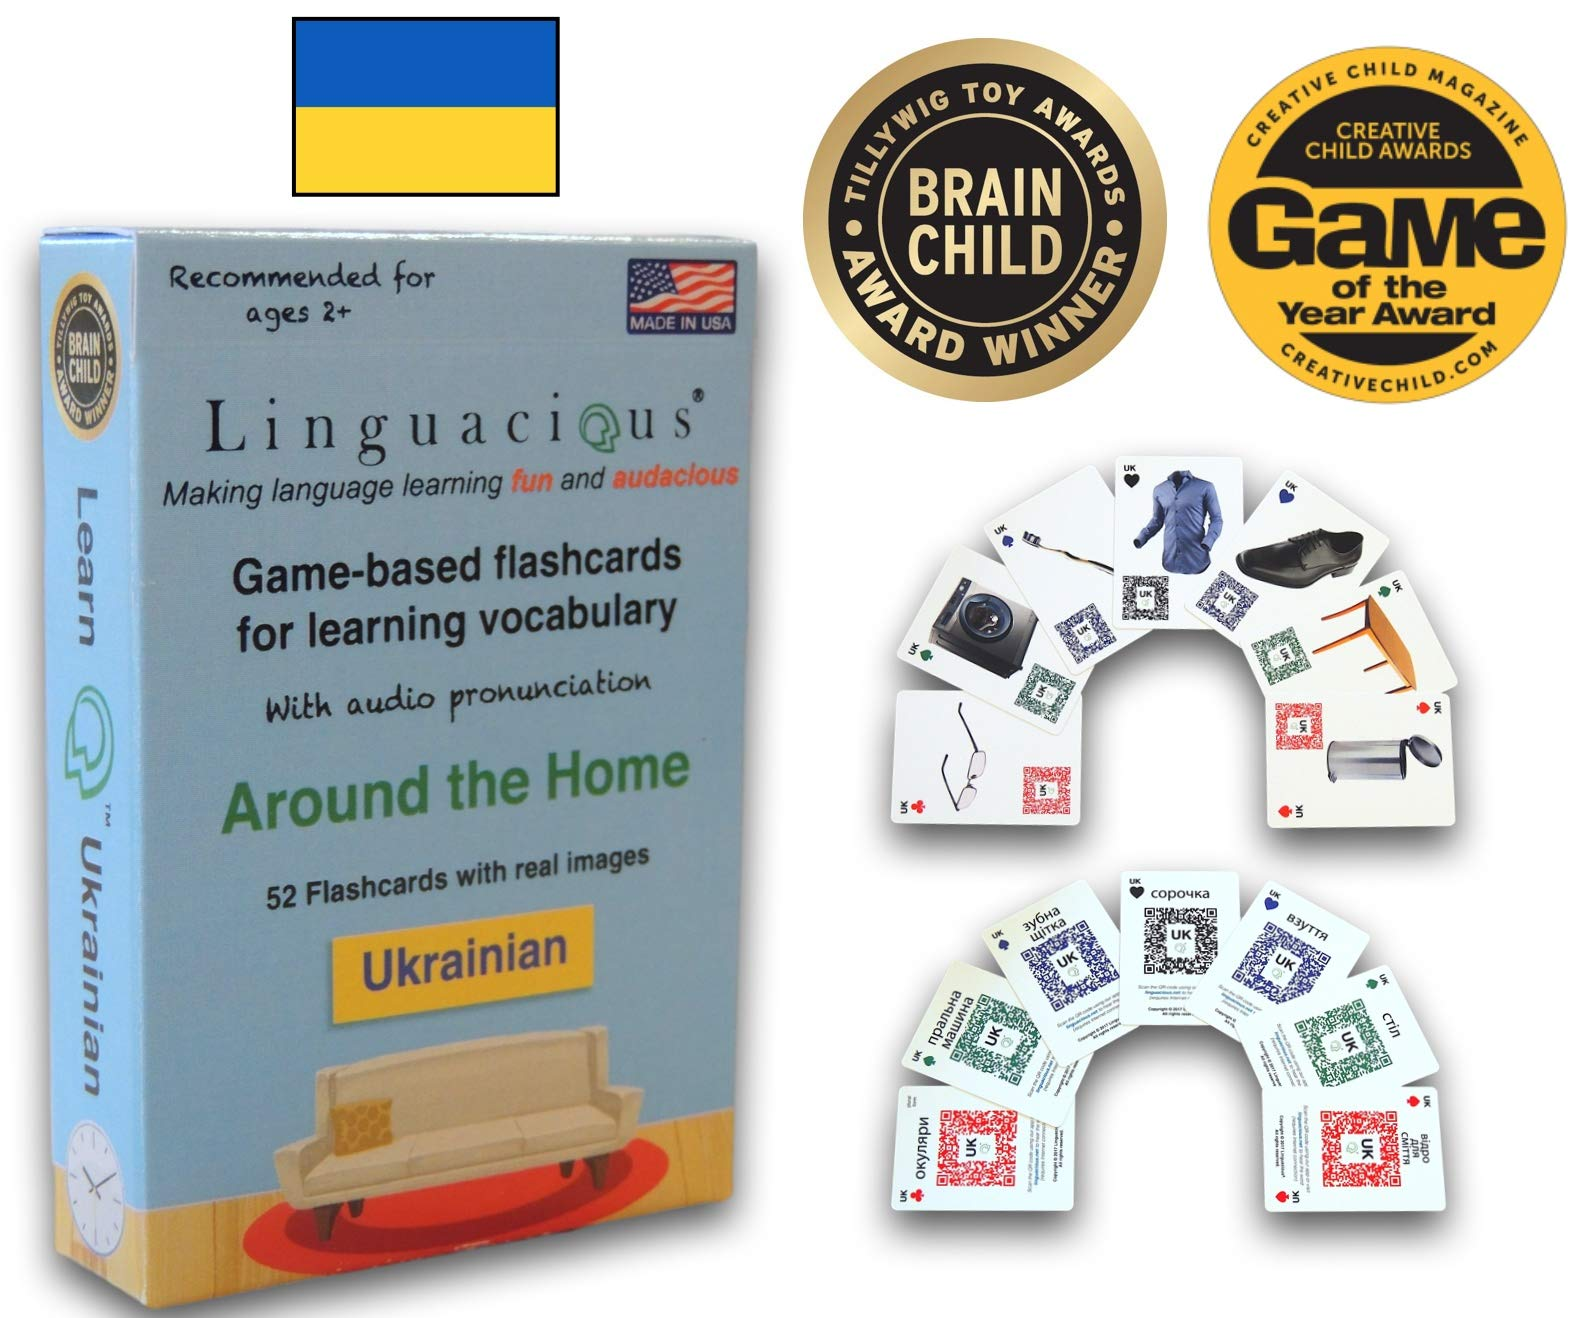 Linguacious Award-Winning Around The Home Ukrainian Flashcard Game - with Audio! by Linguacious